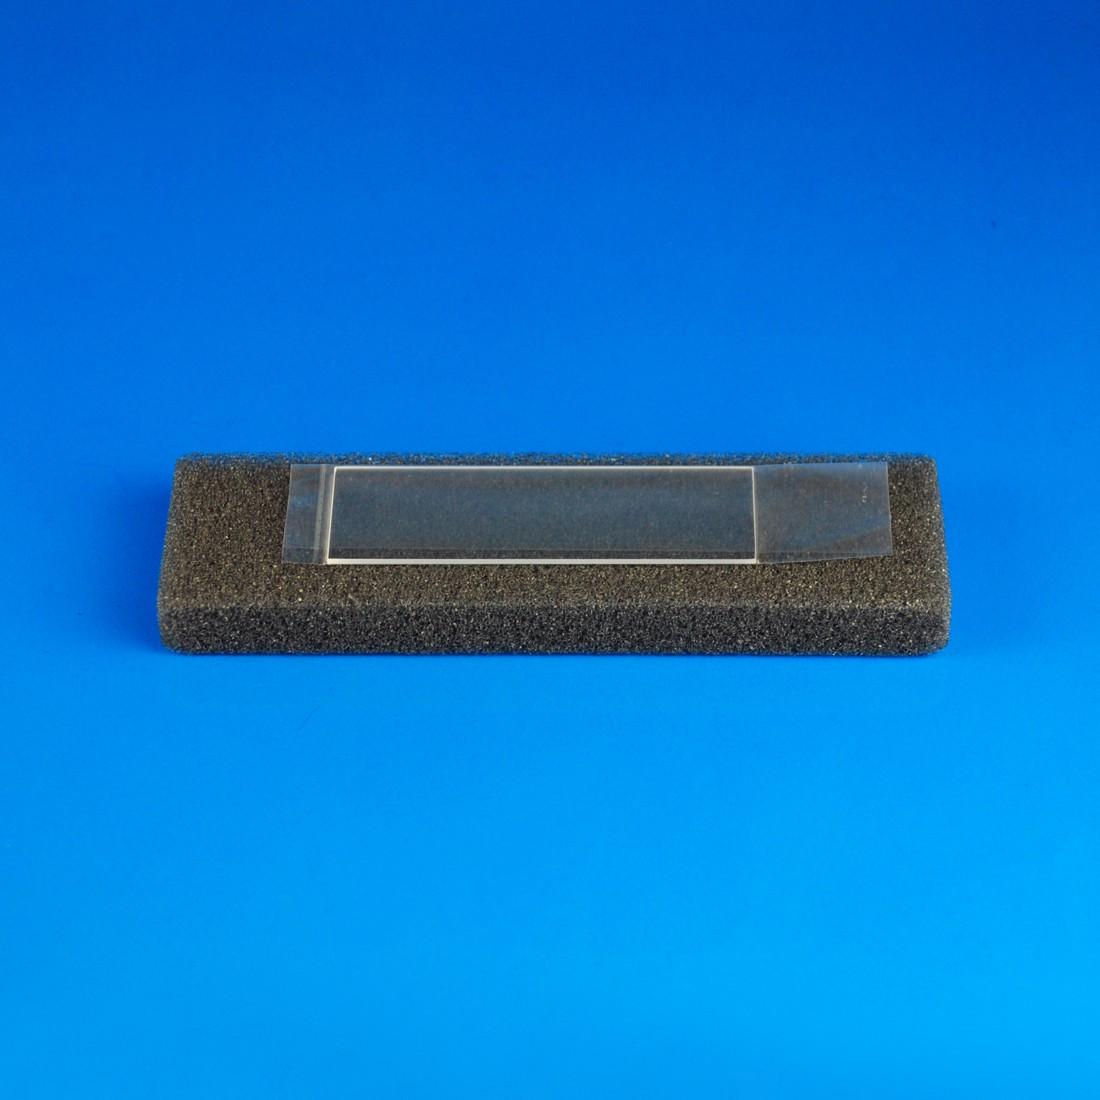 "Quartz Microscope Slide, 1""x3"" (25.4 x 76.2 mm) x 1 mm Thick"